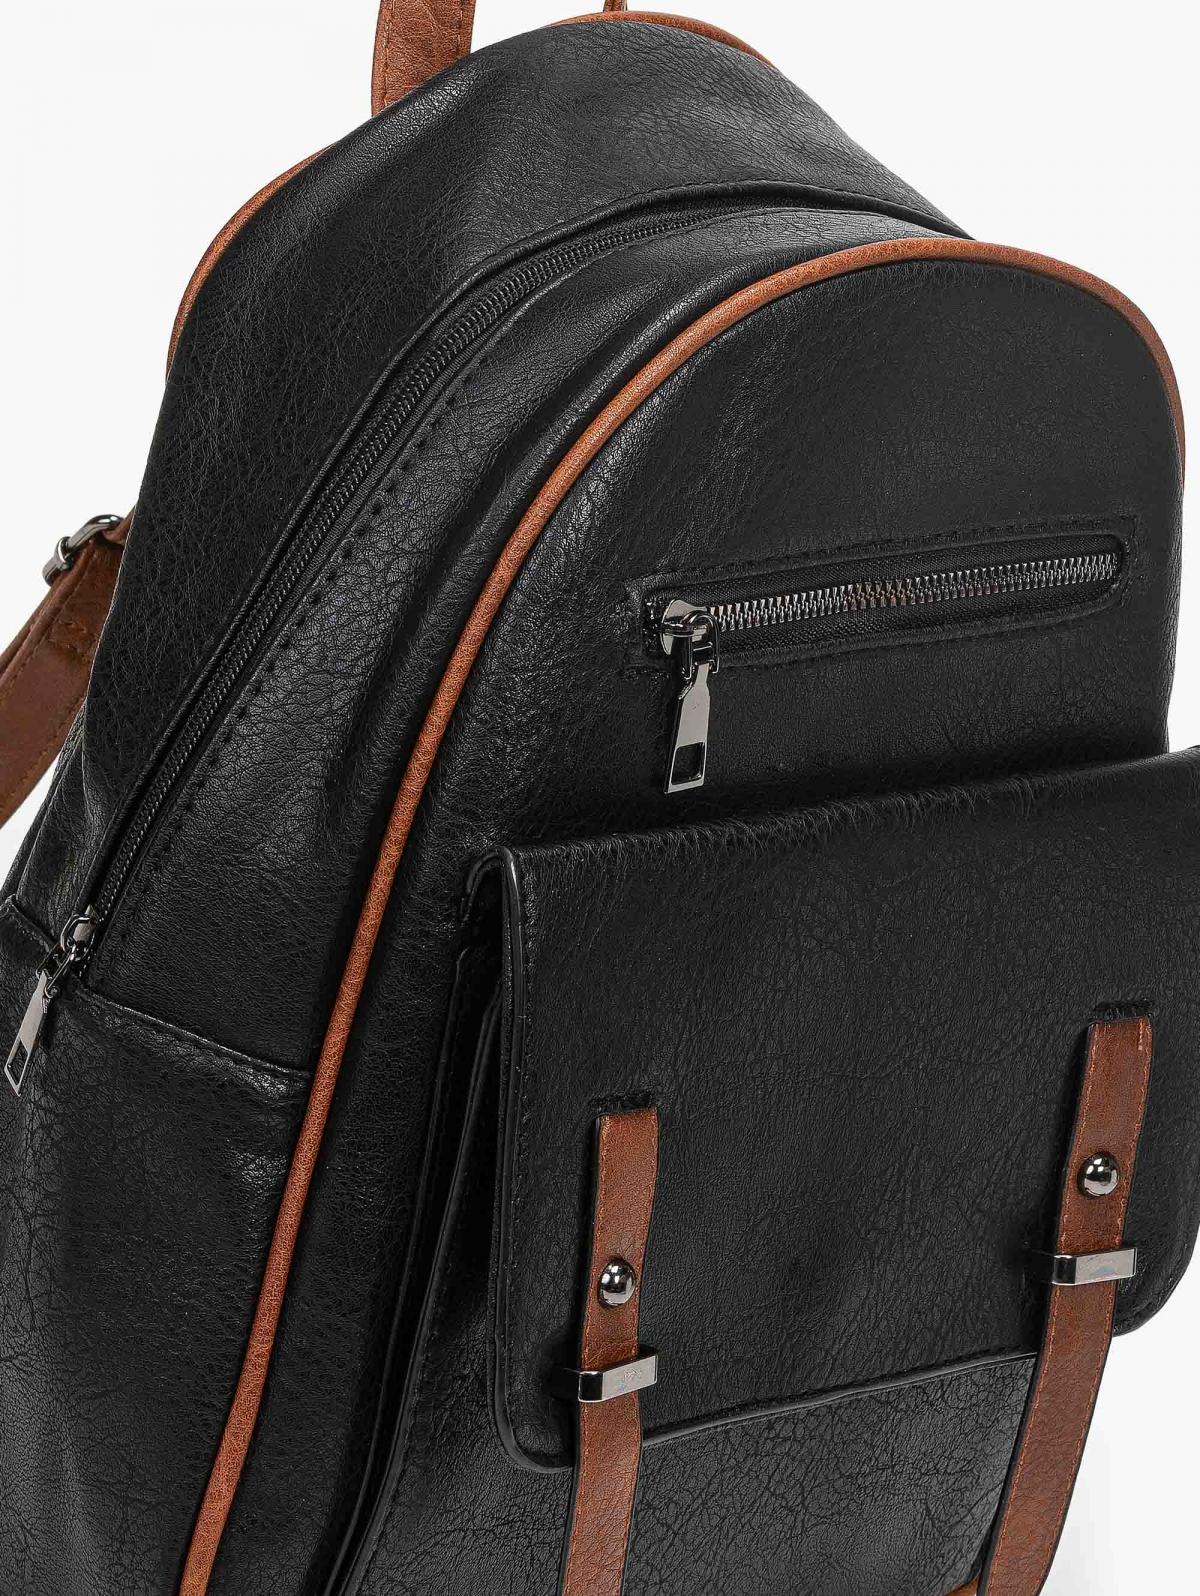 Backpack με εξωτερική θήκη και λουράκια - Μαύρο